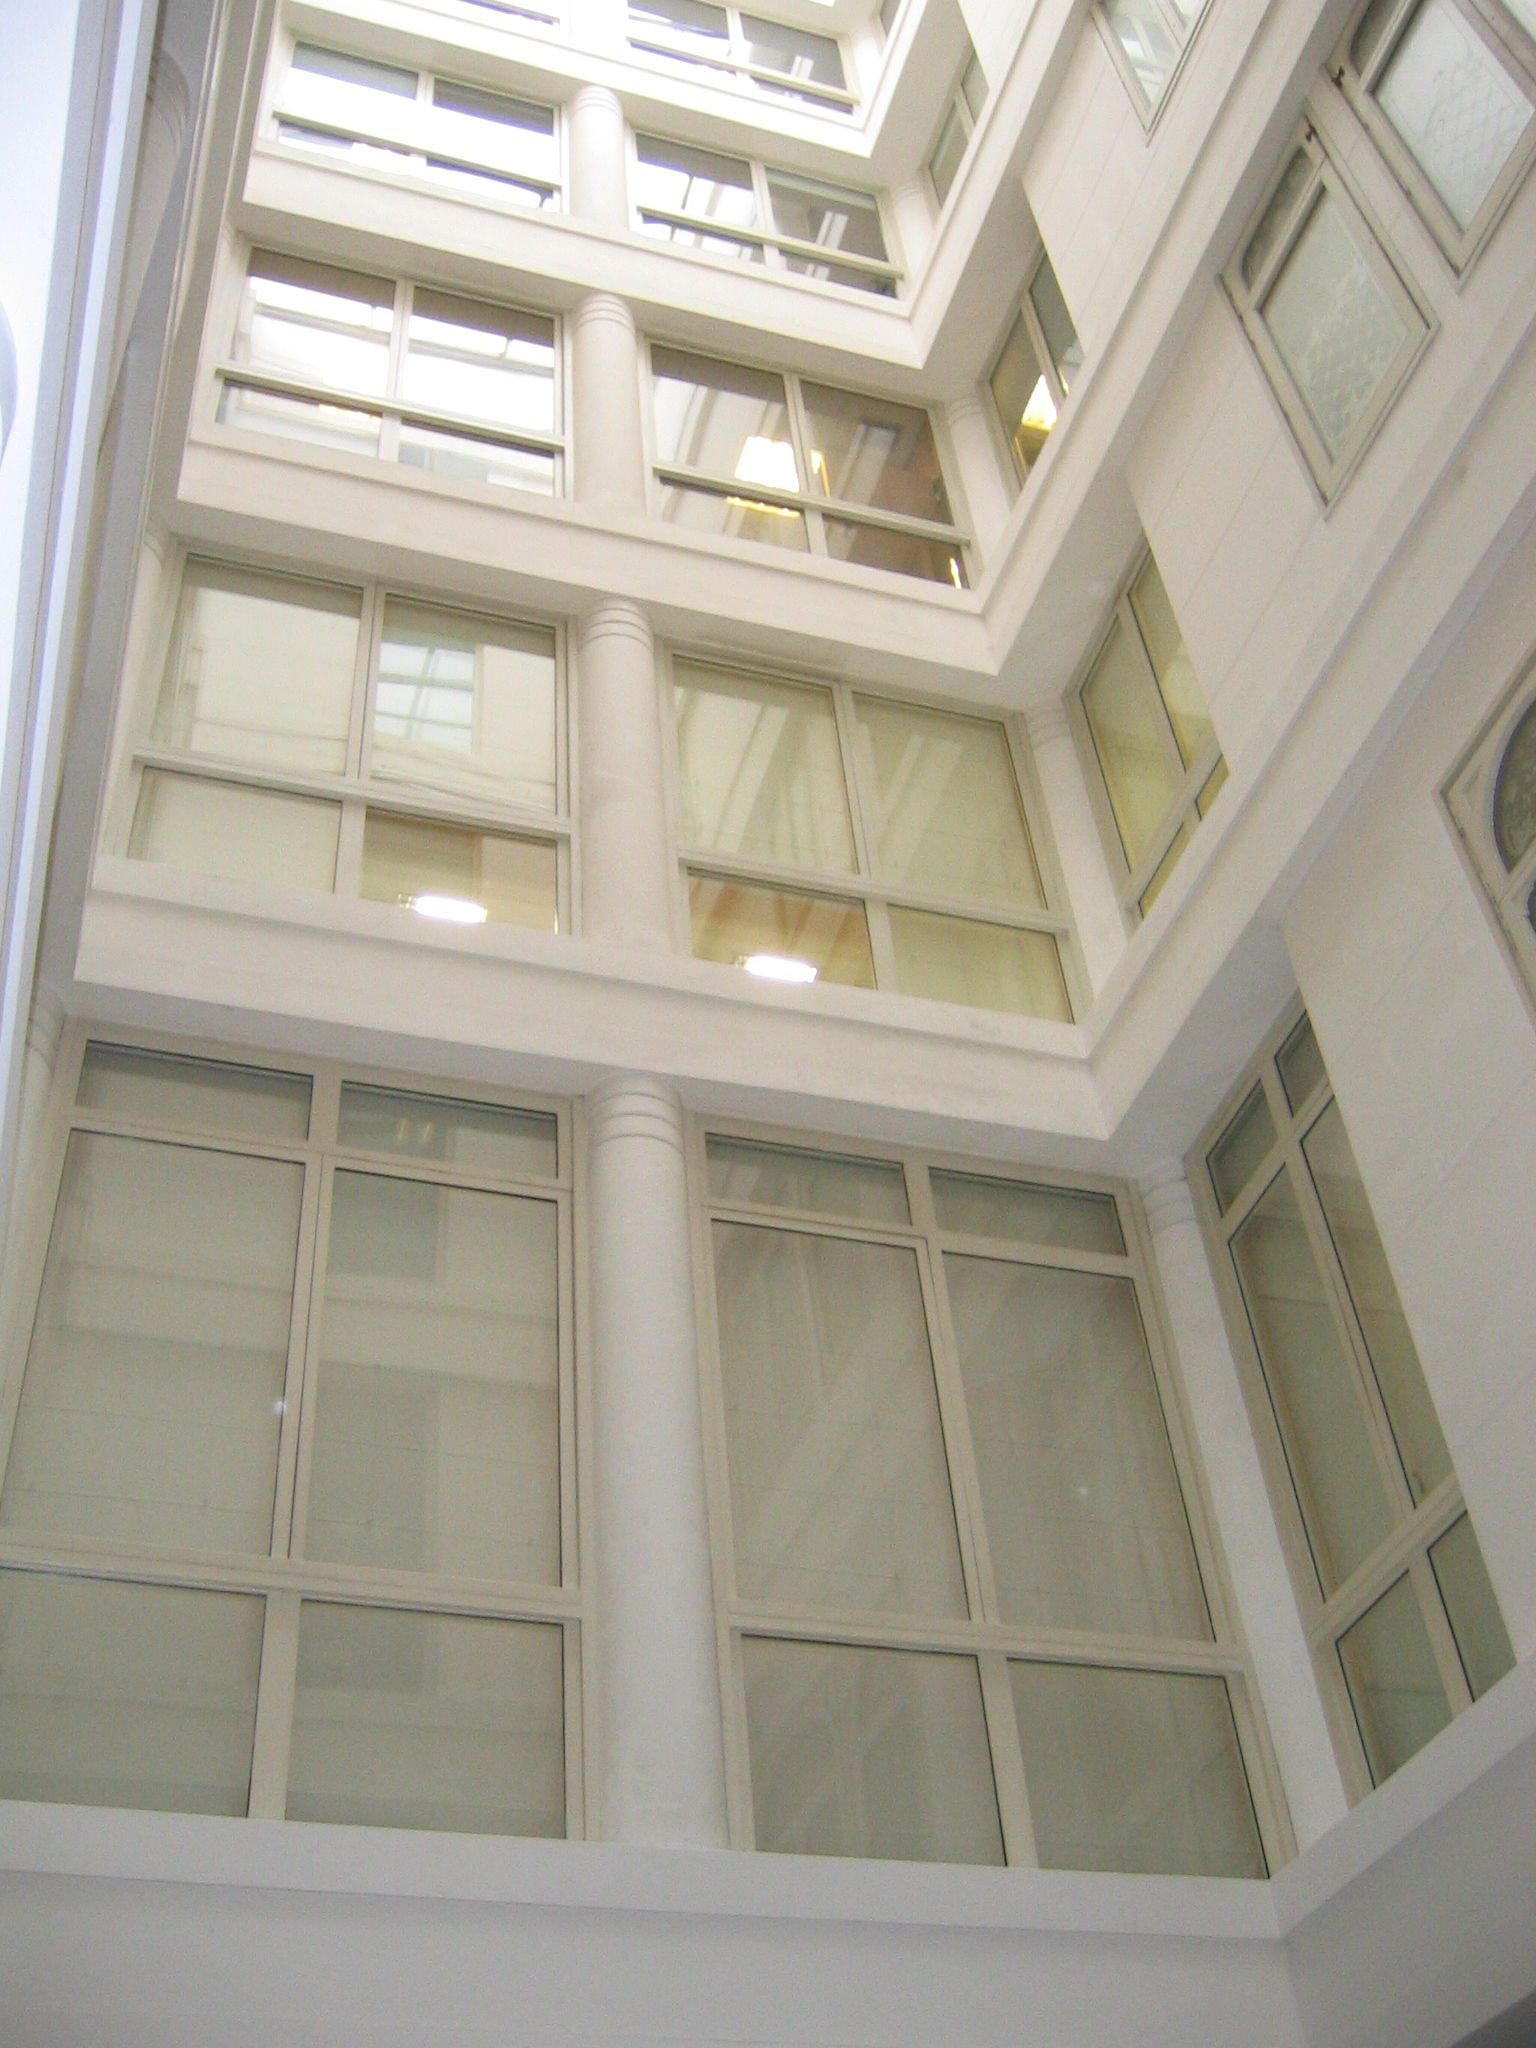 Patio interior Barcelona